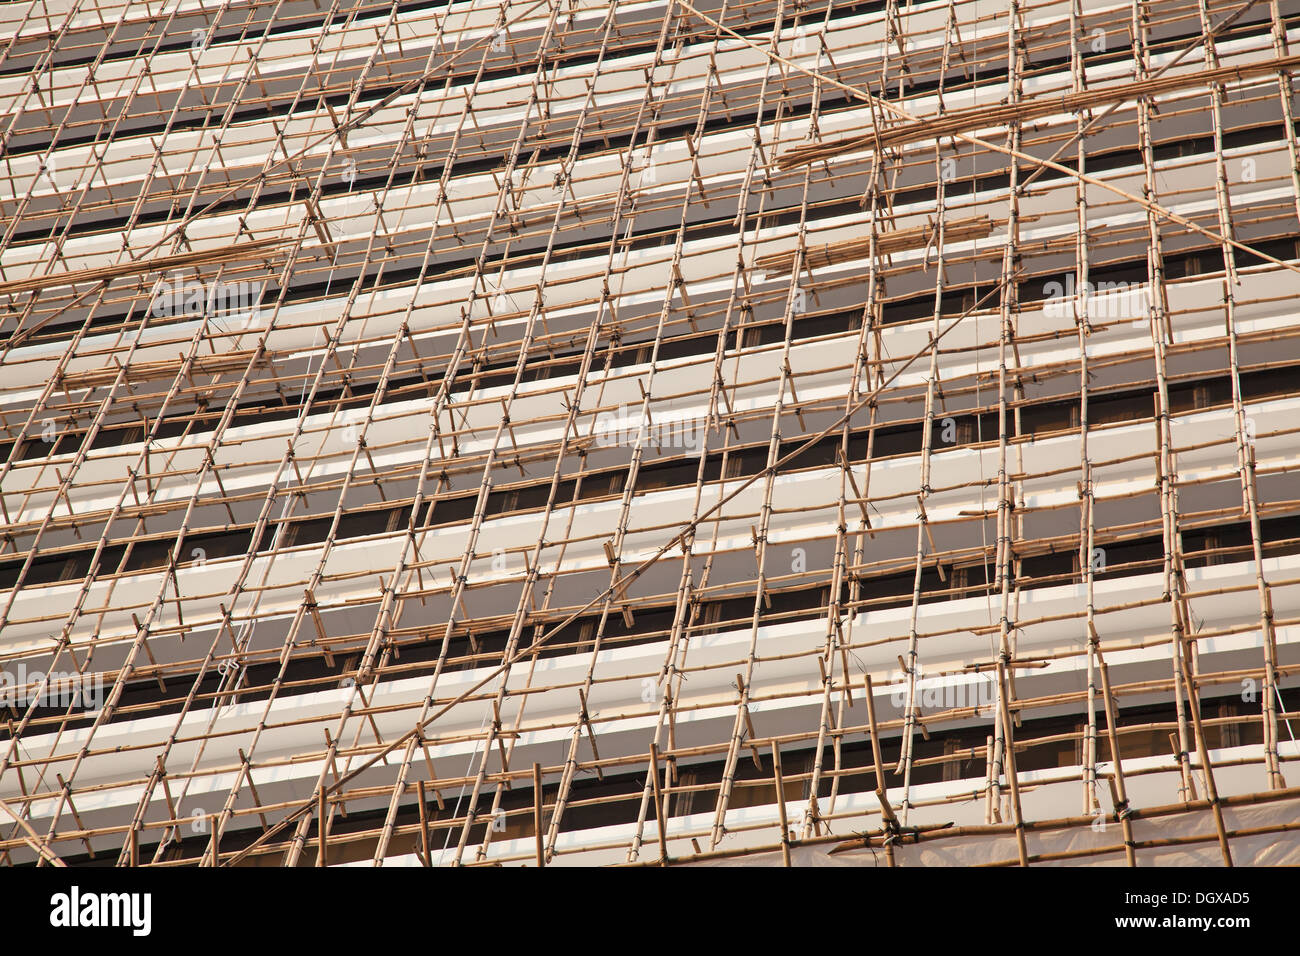 Hong Kong's famous bamboo scaffolding - Stock Image